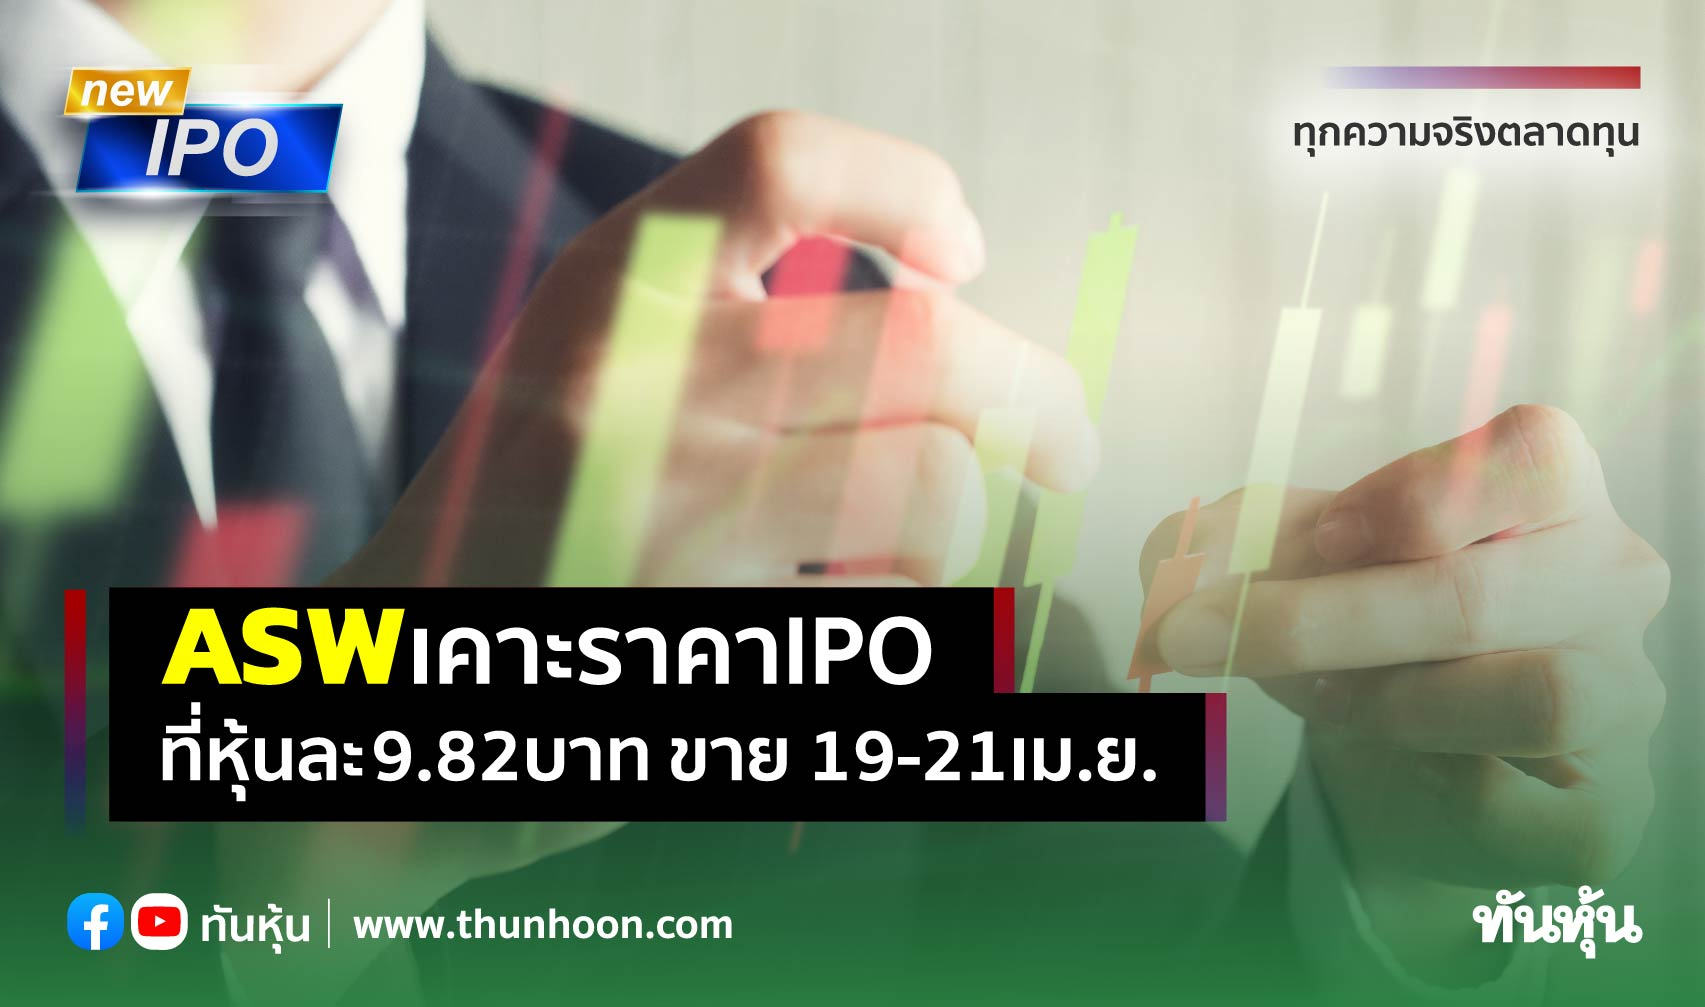 ASW เคาะราคา IPO ที่หุ้นละ 9.82 บาท ขาย 19-21 เม.ย.